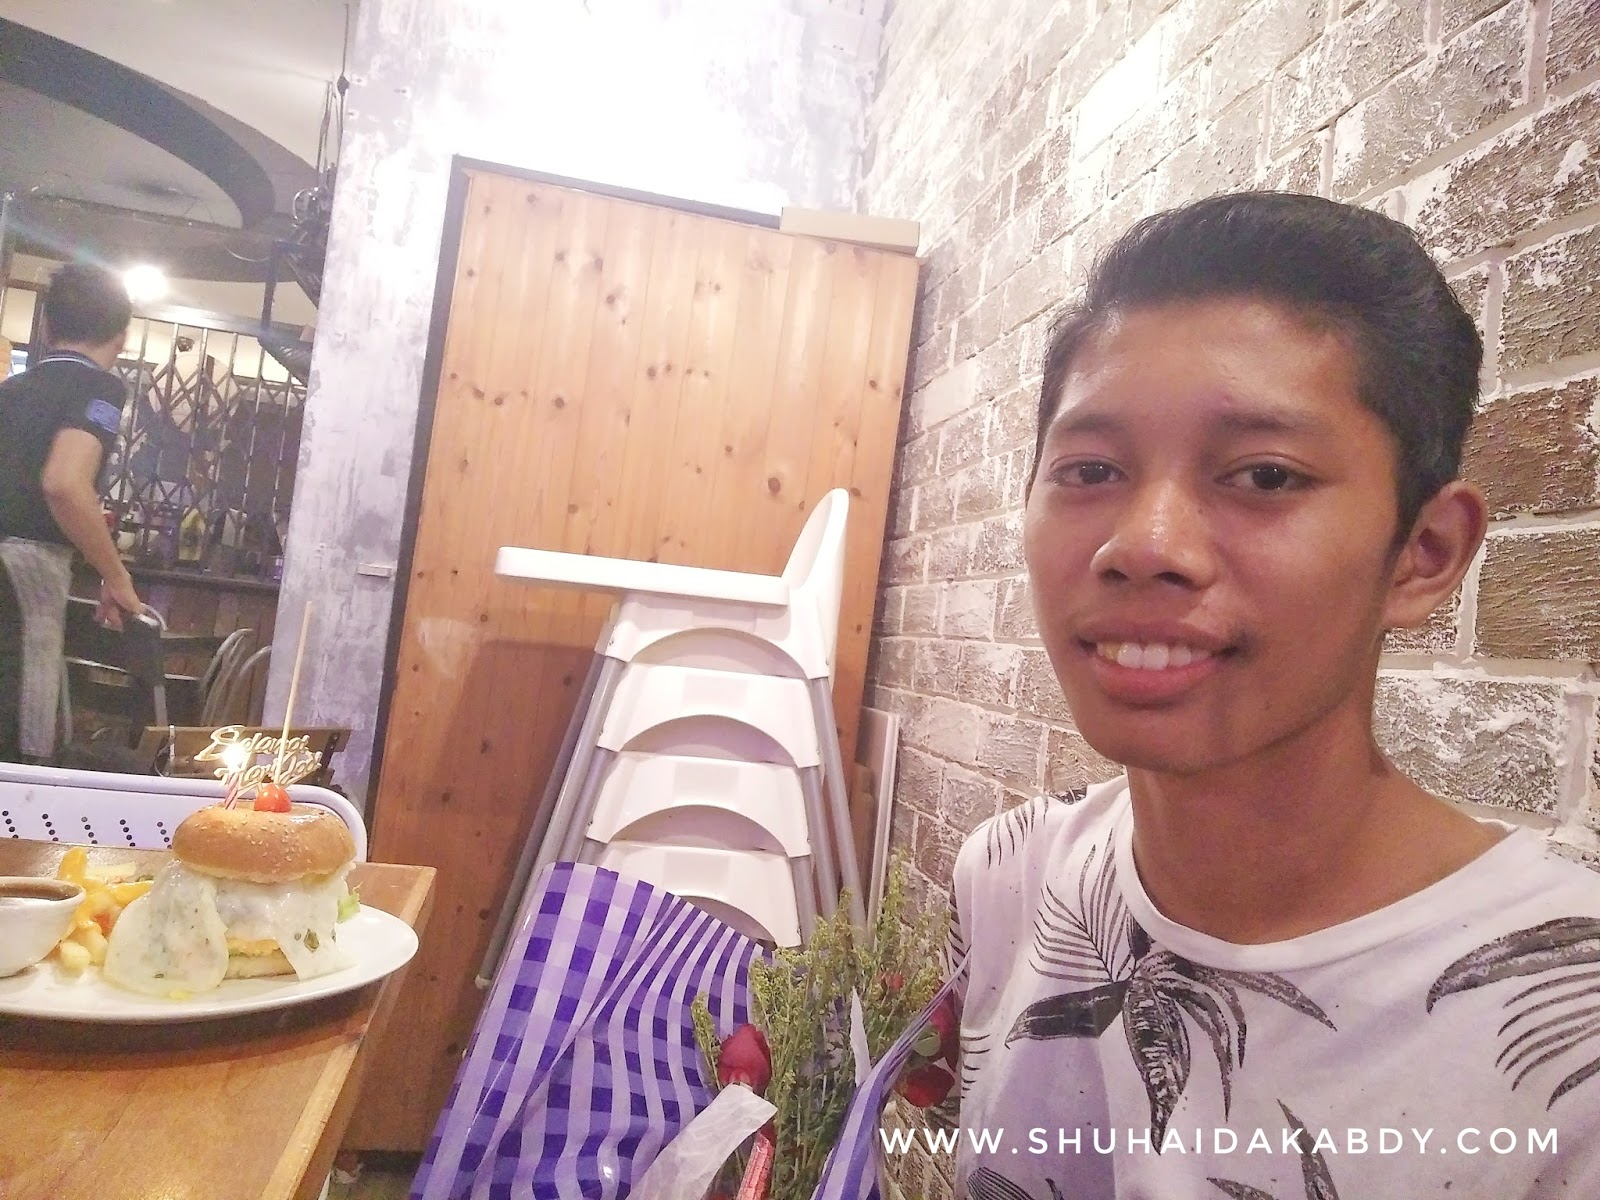 Sambutan Harijadi Abang di Washout Laundry & Cafe